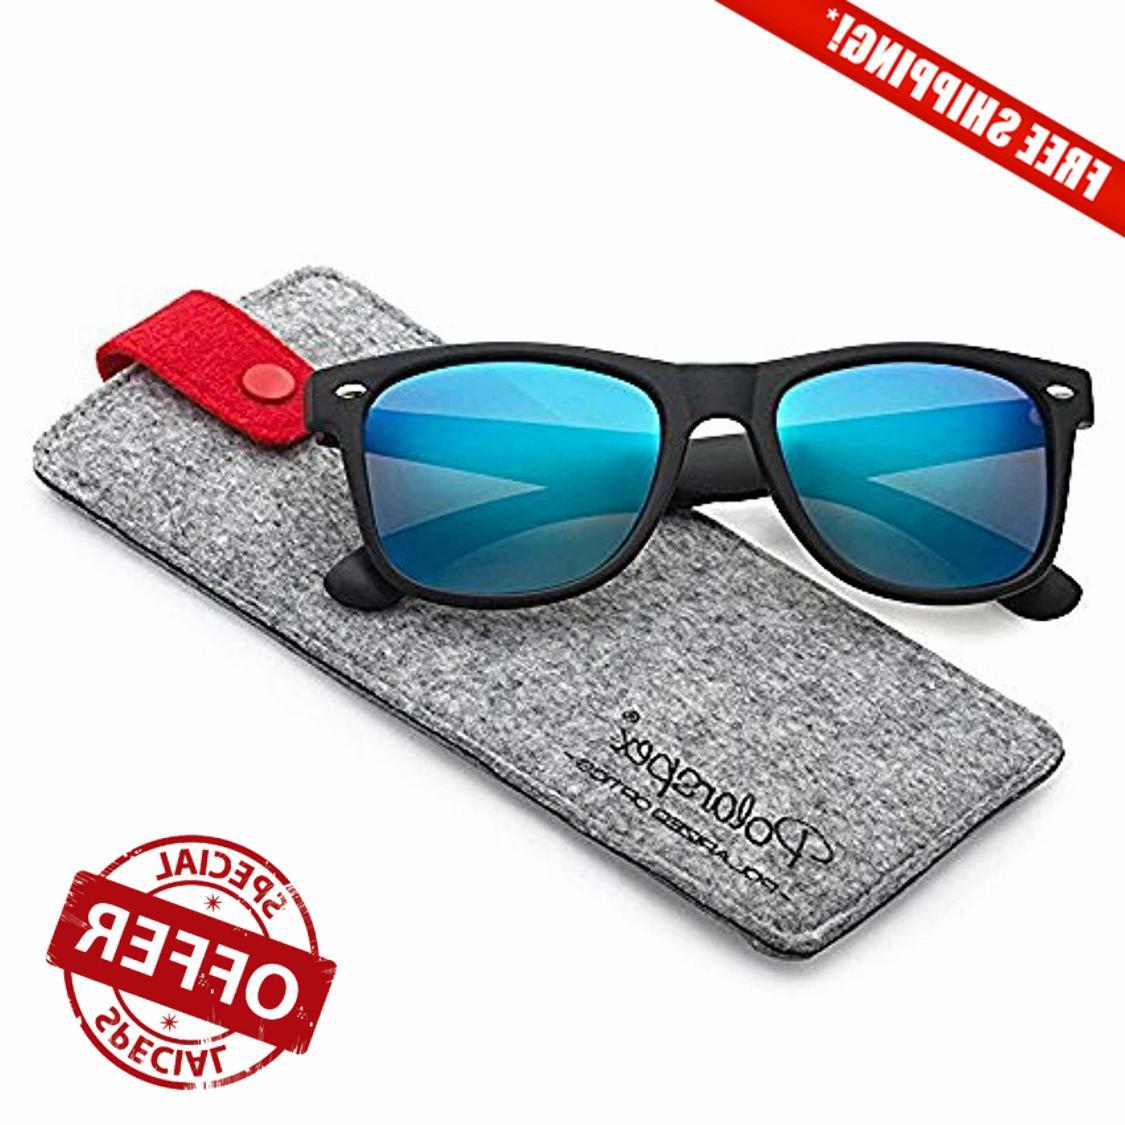 retro classic trendy stylish sunglasses polarized 80